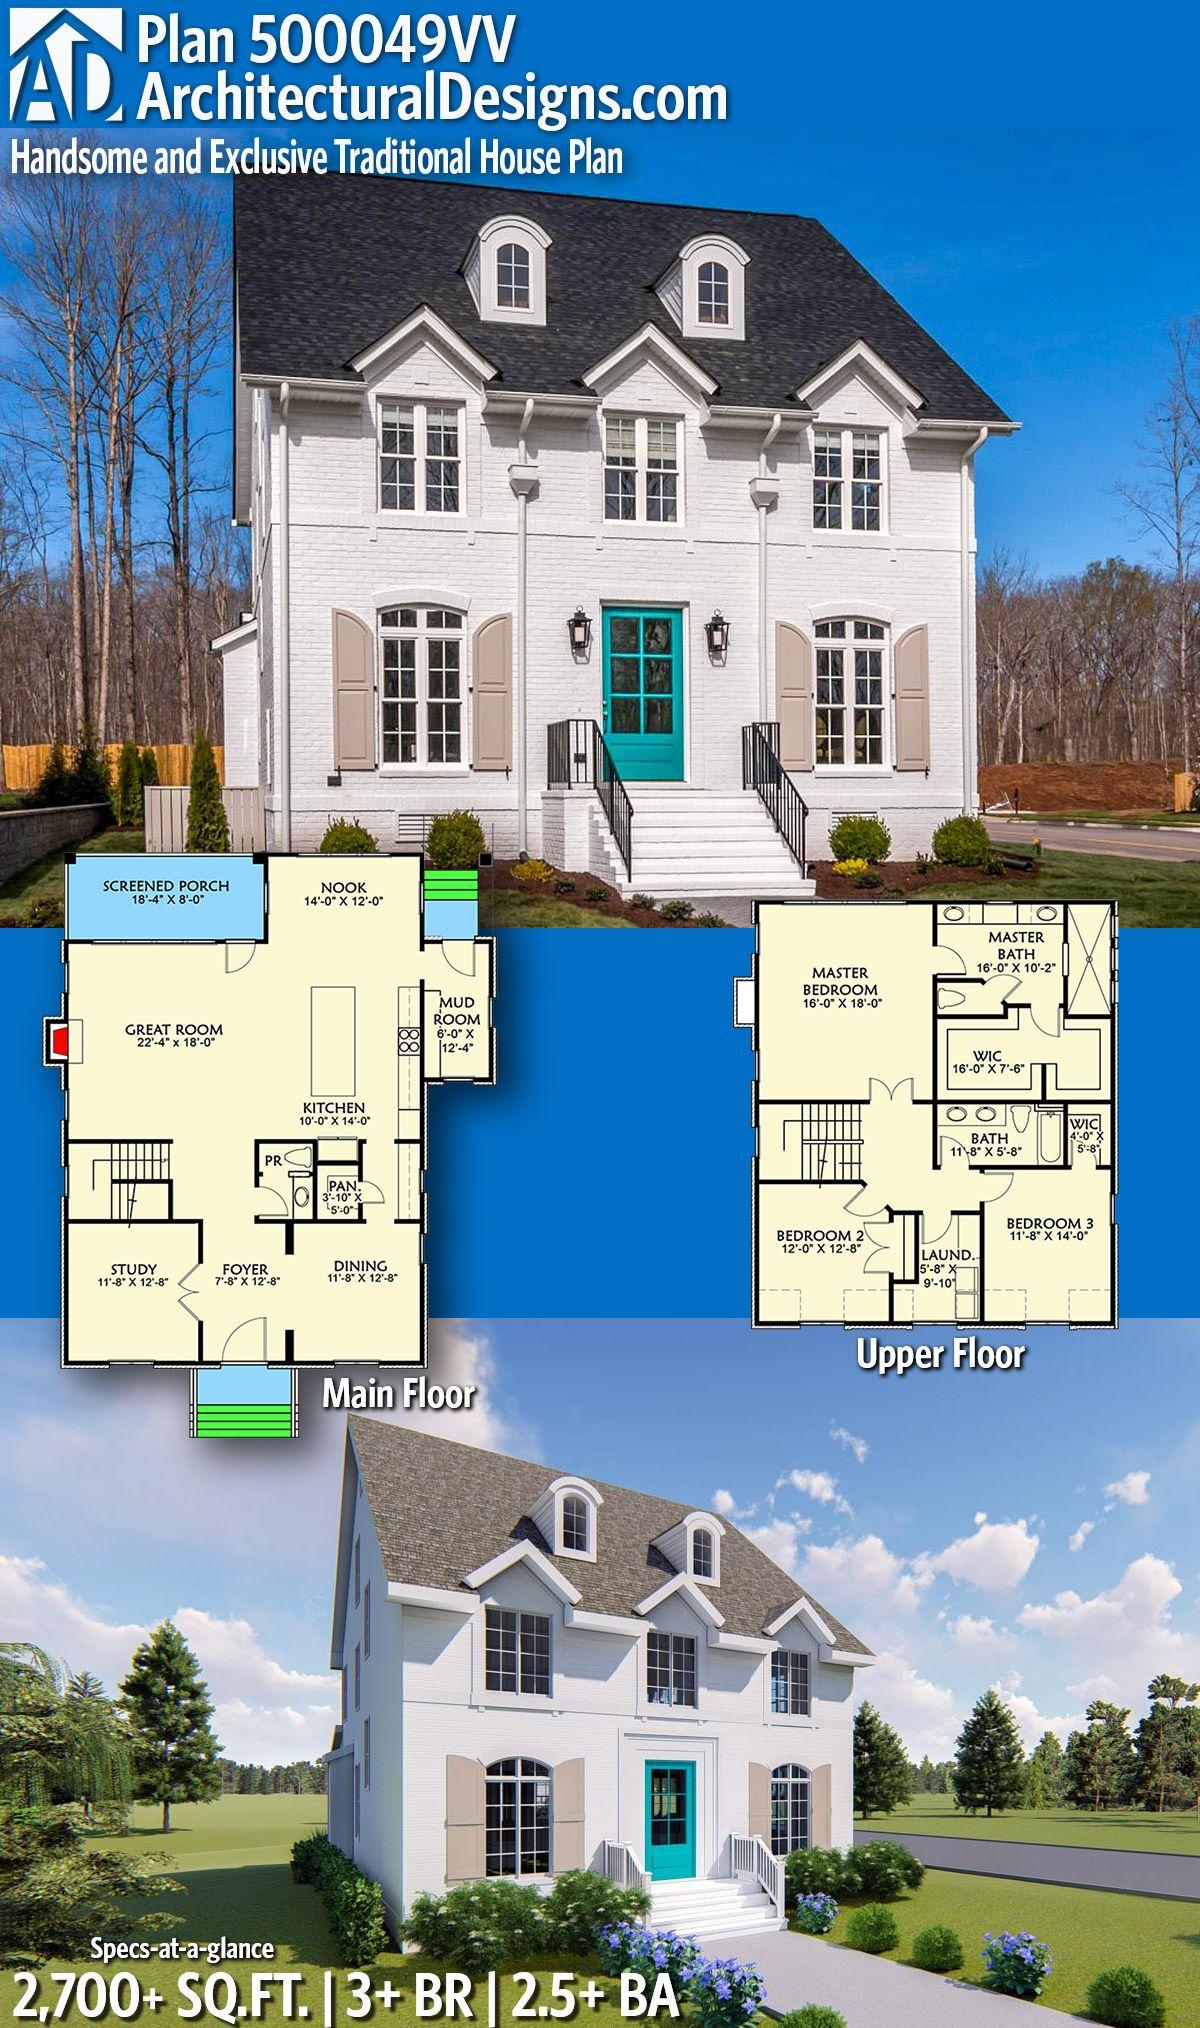 Architectural Designs Exclusive House Plan 500049VV